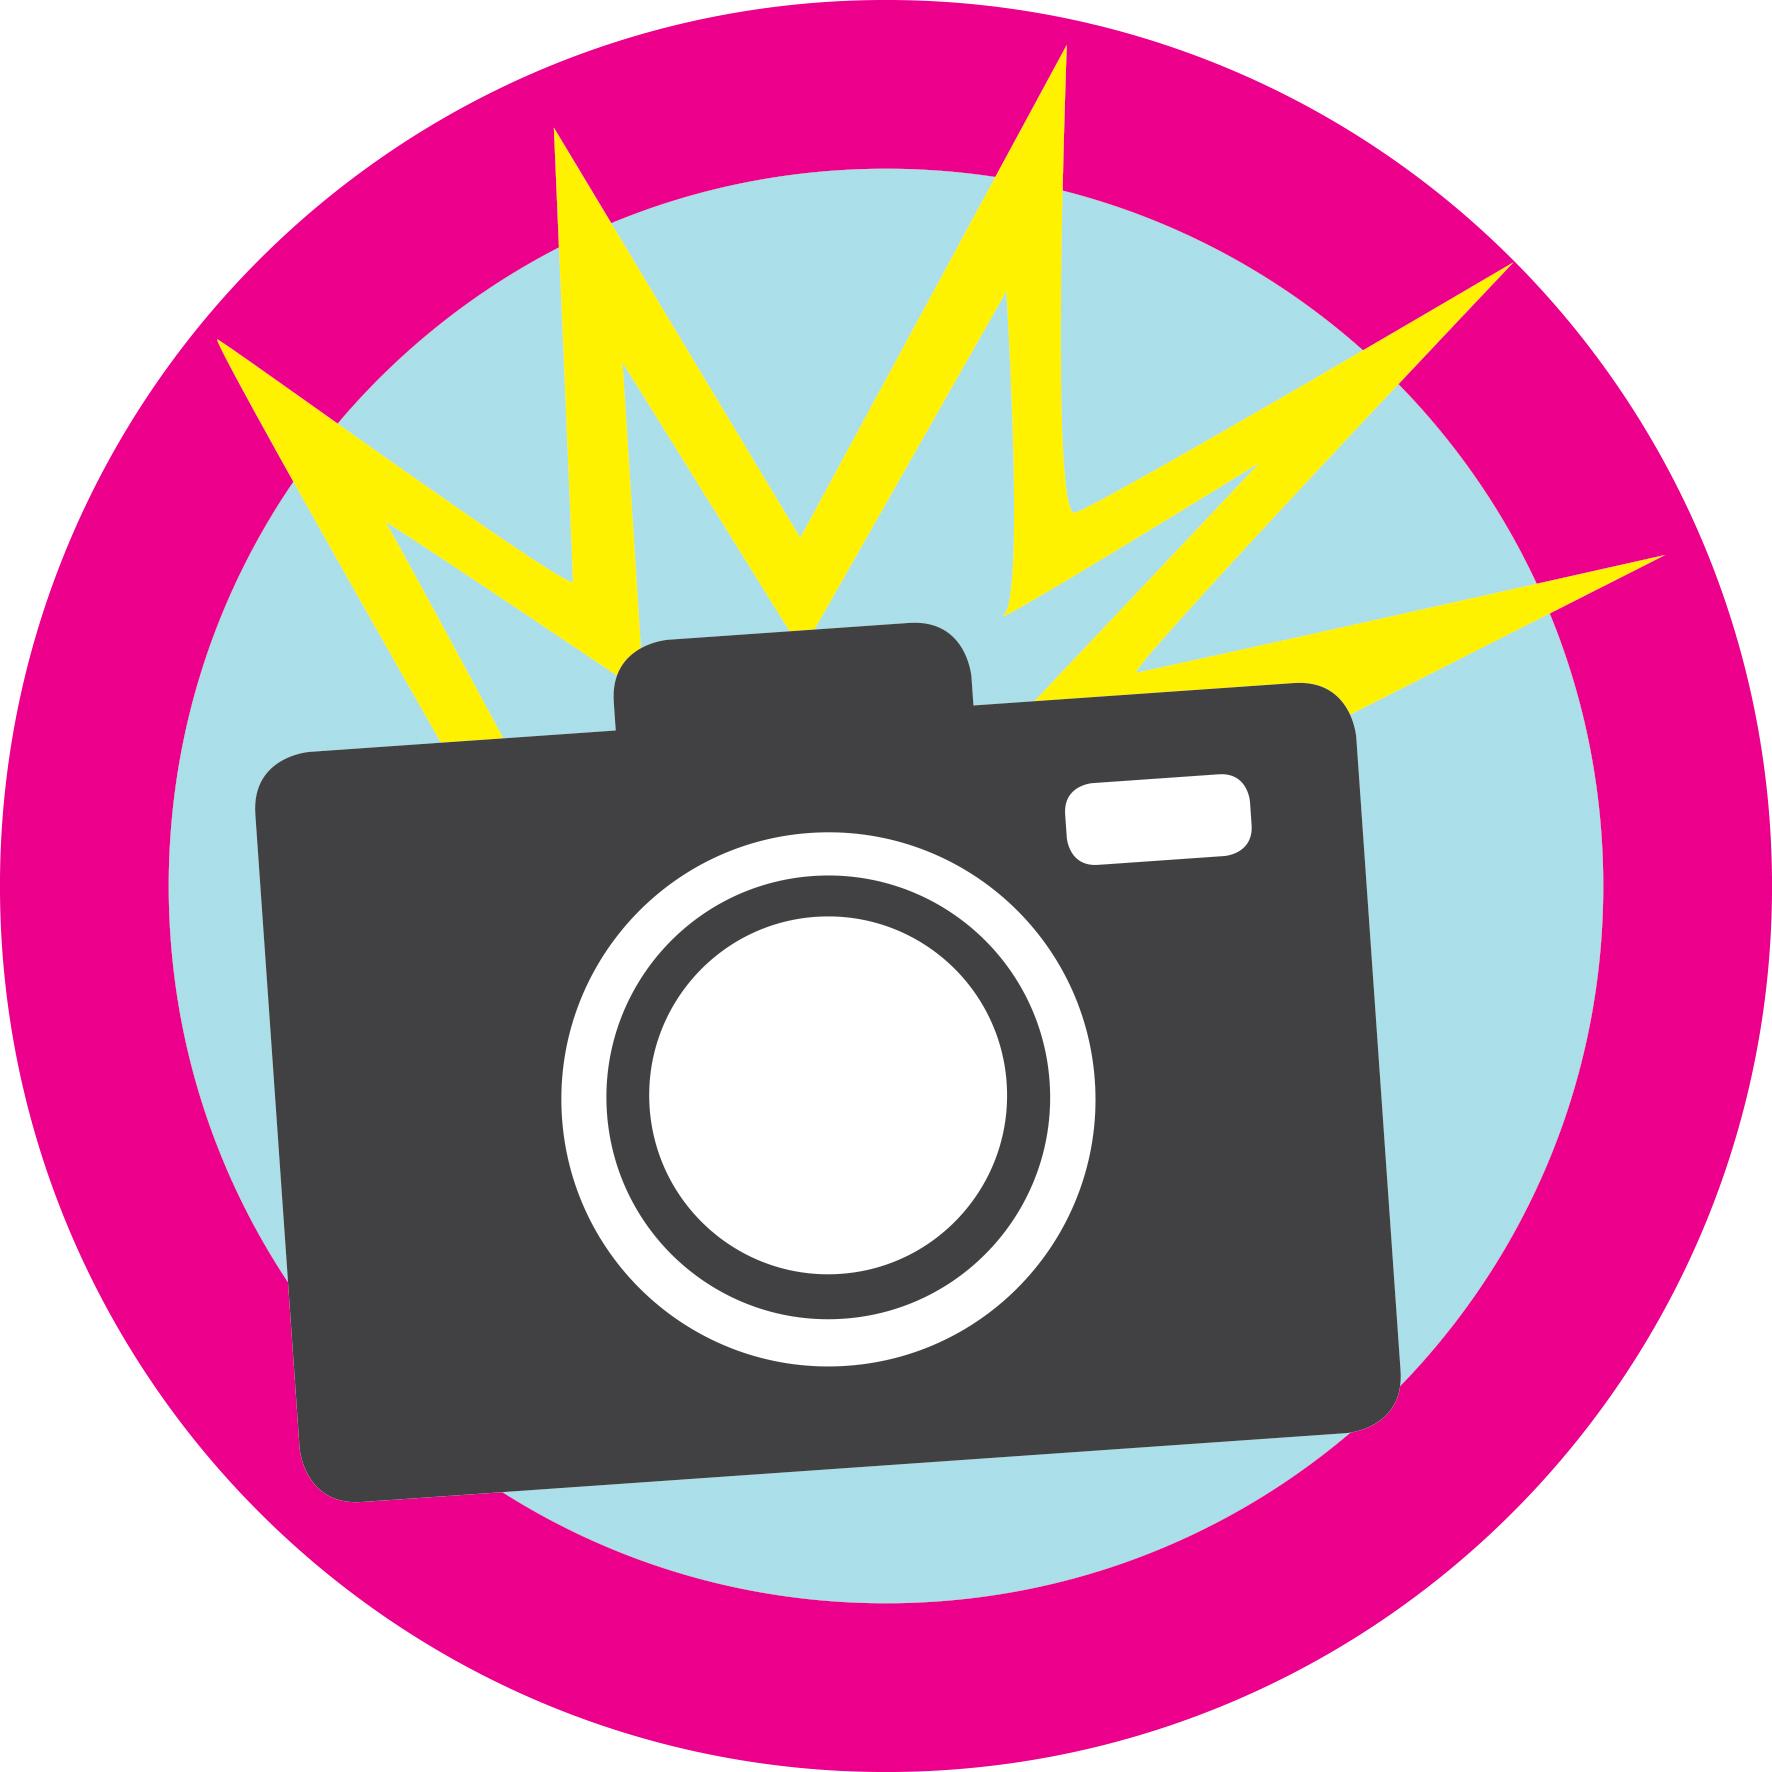 paparazzi_icon.jpg